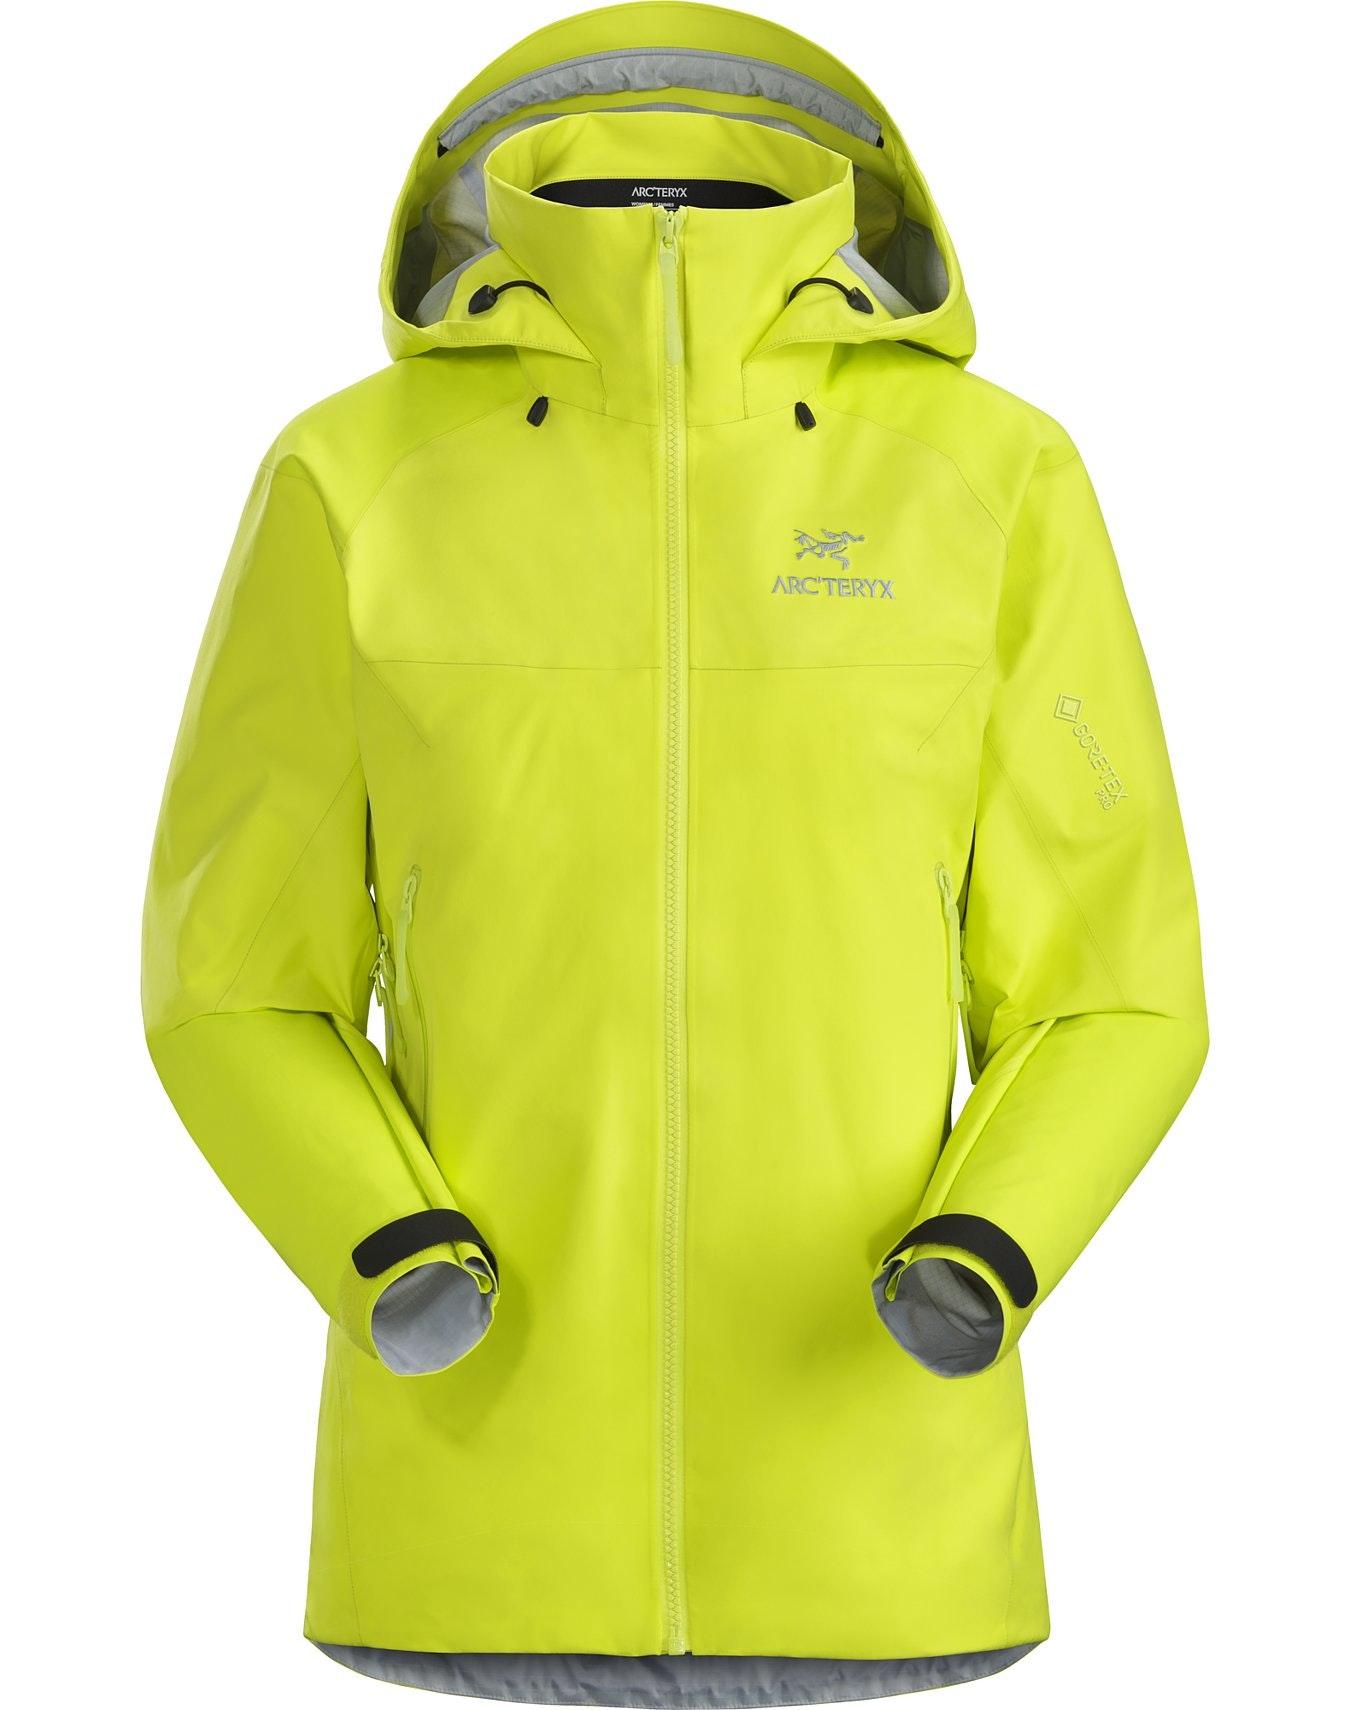 beta ar jacket damen  bekleidung damen sweatshirt c 1_18 #9